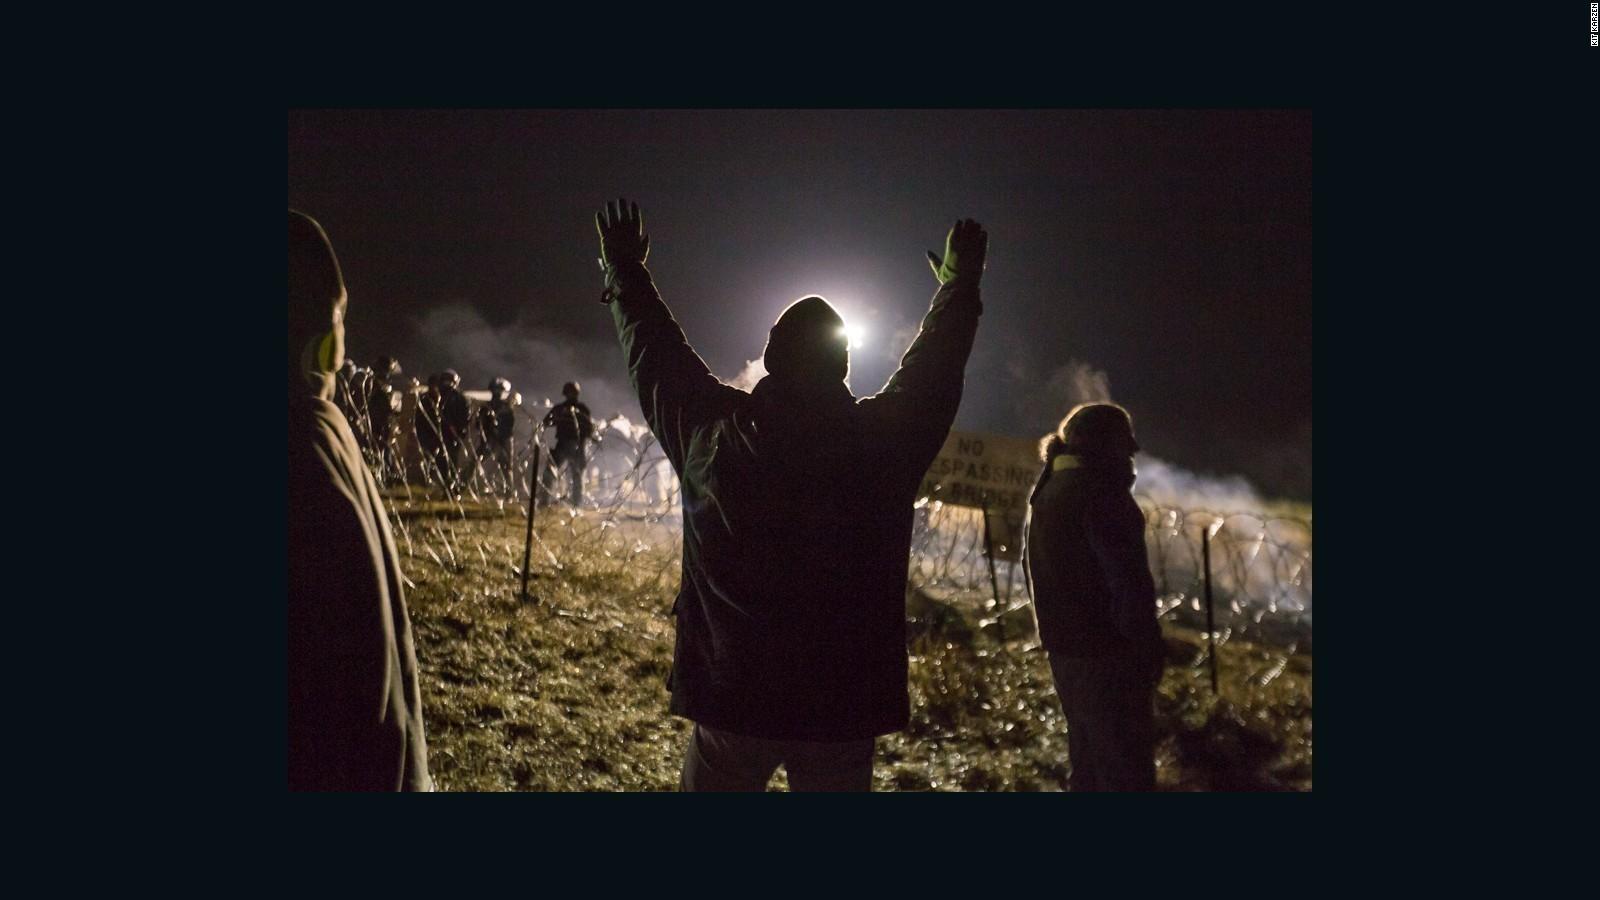 North Dakota Pipeline: Protesters vow to stay despite evacuation order